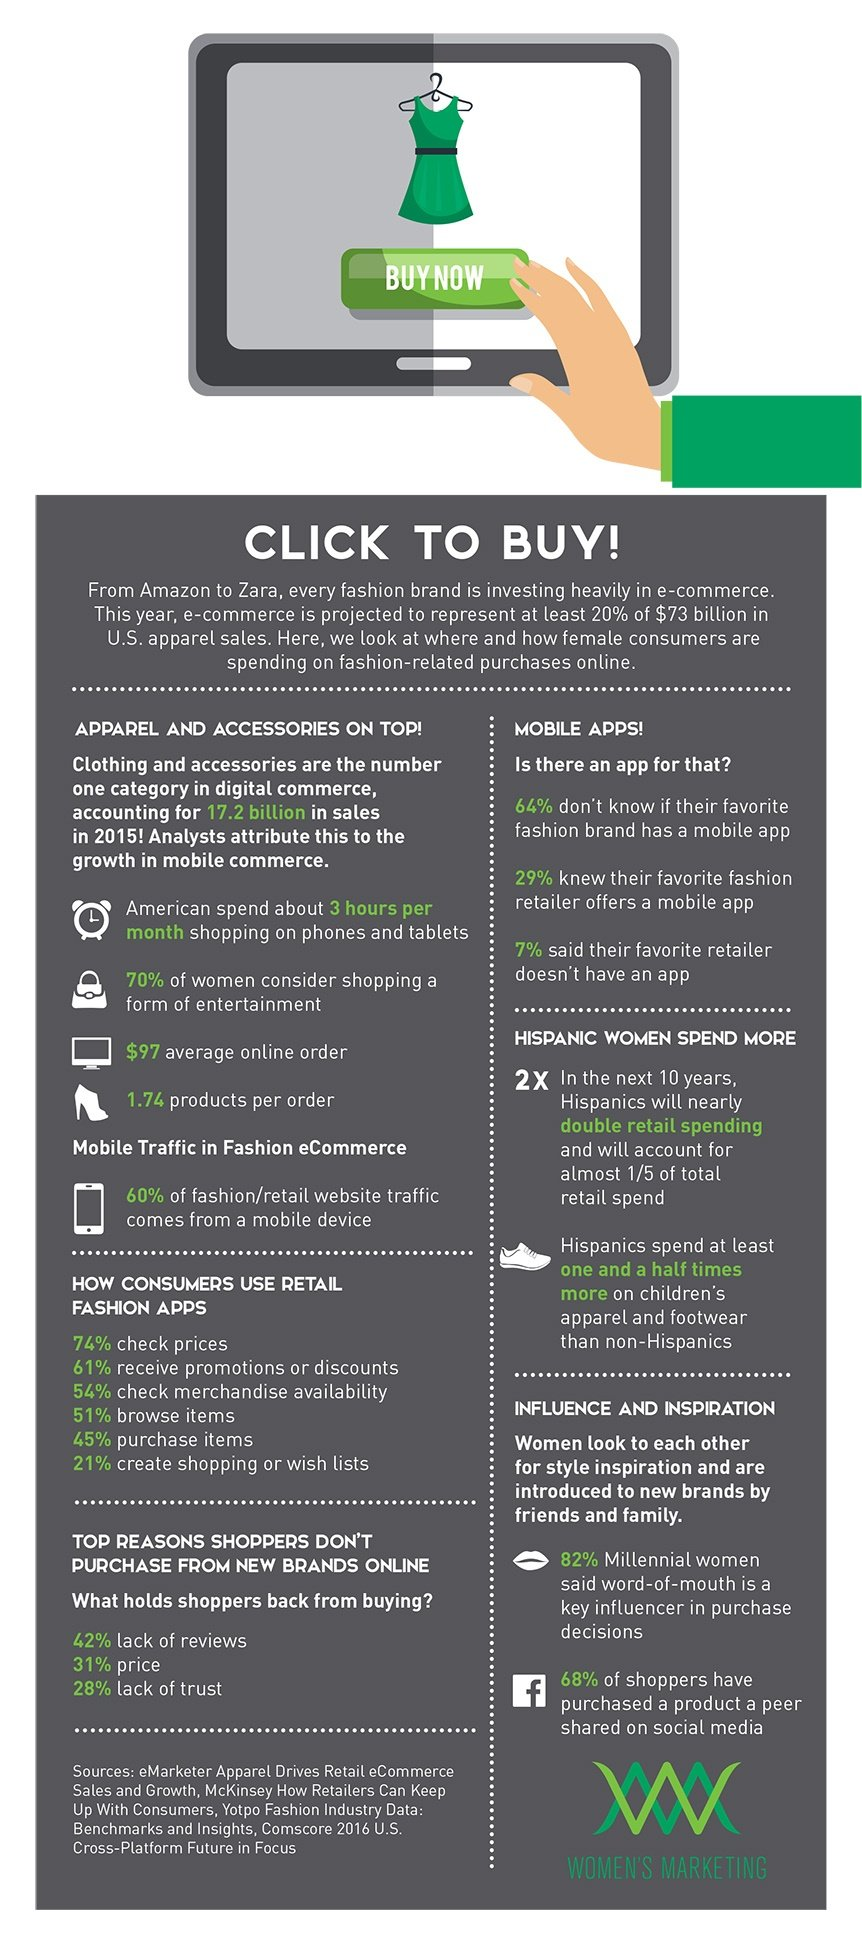 ClickToBuy_Infographic1_2.jpg